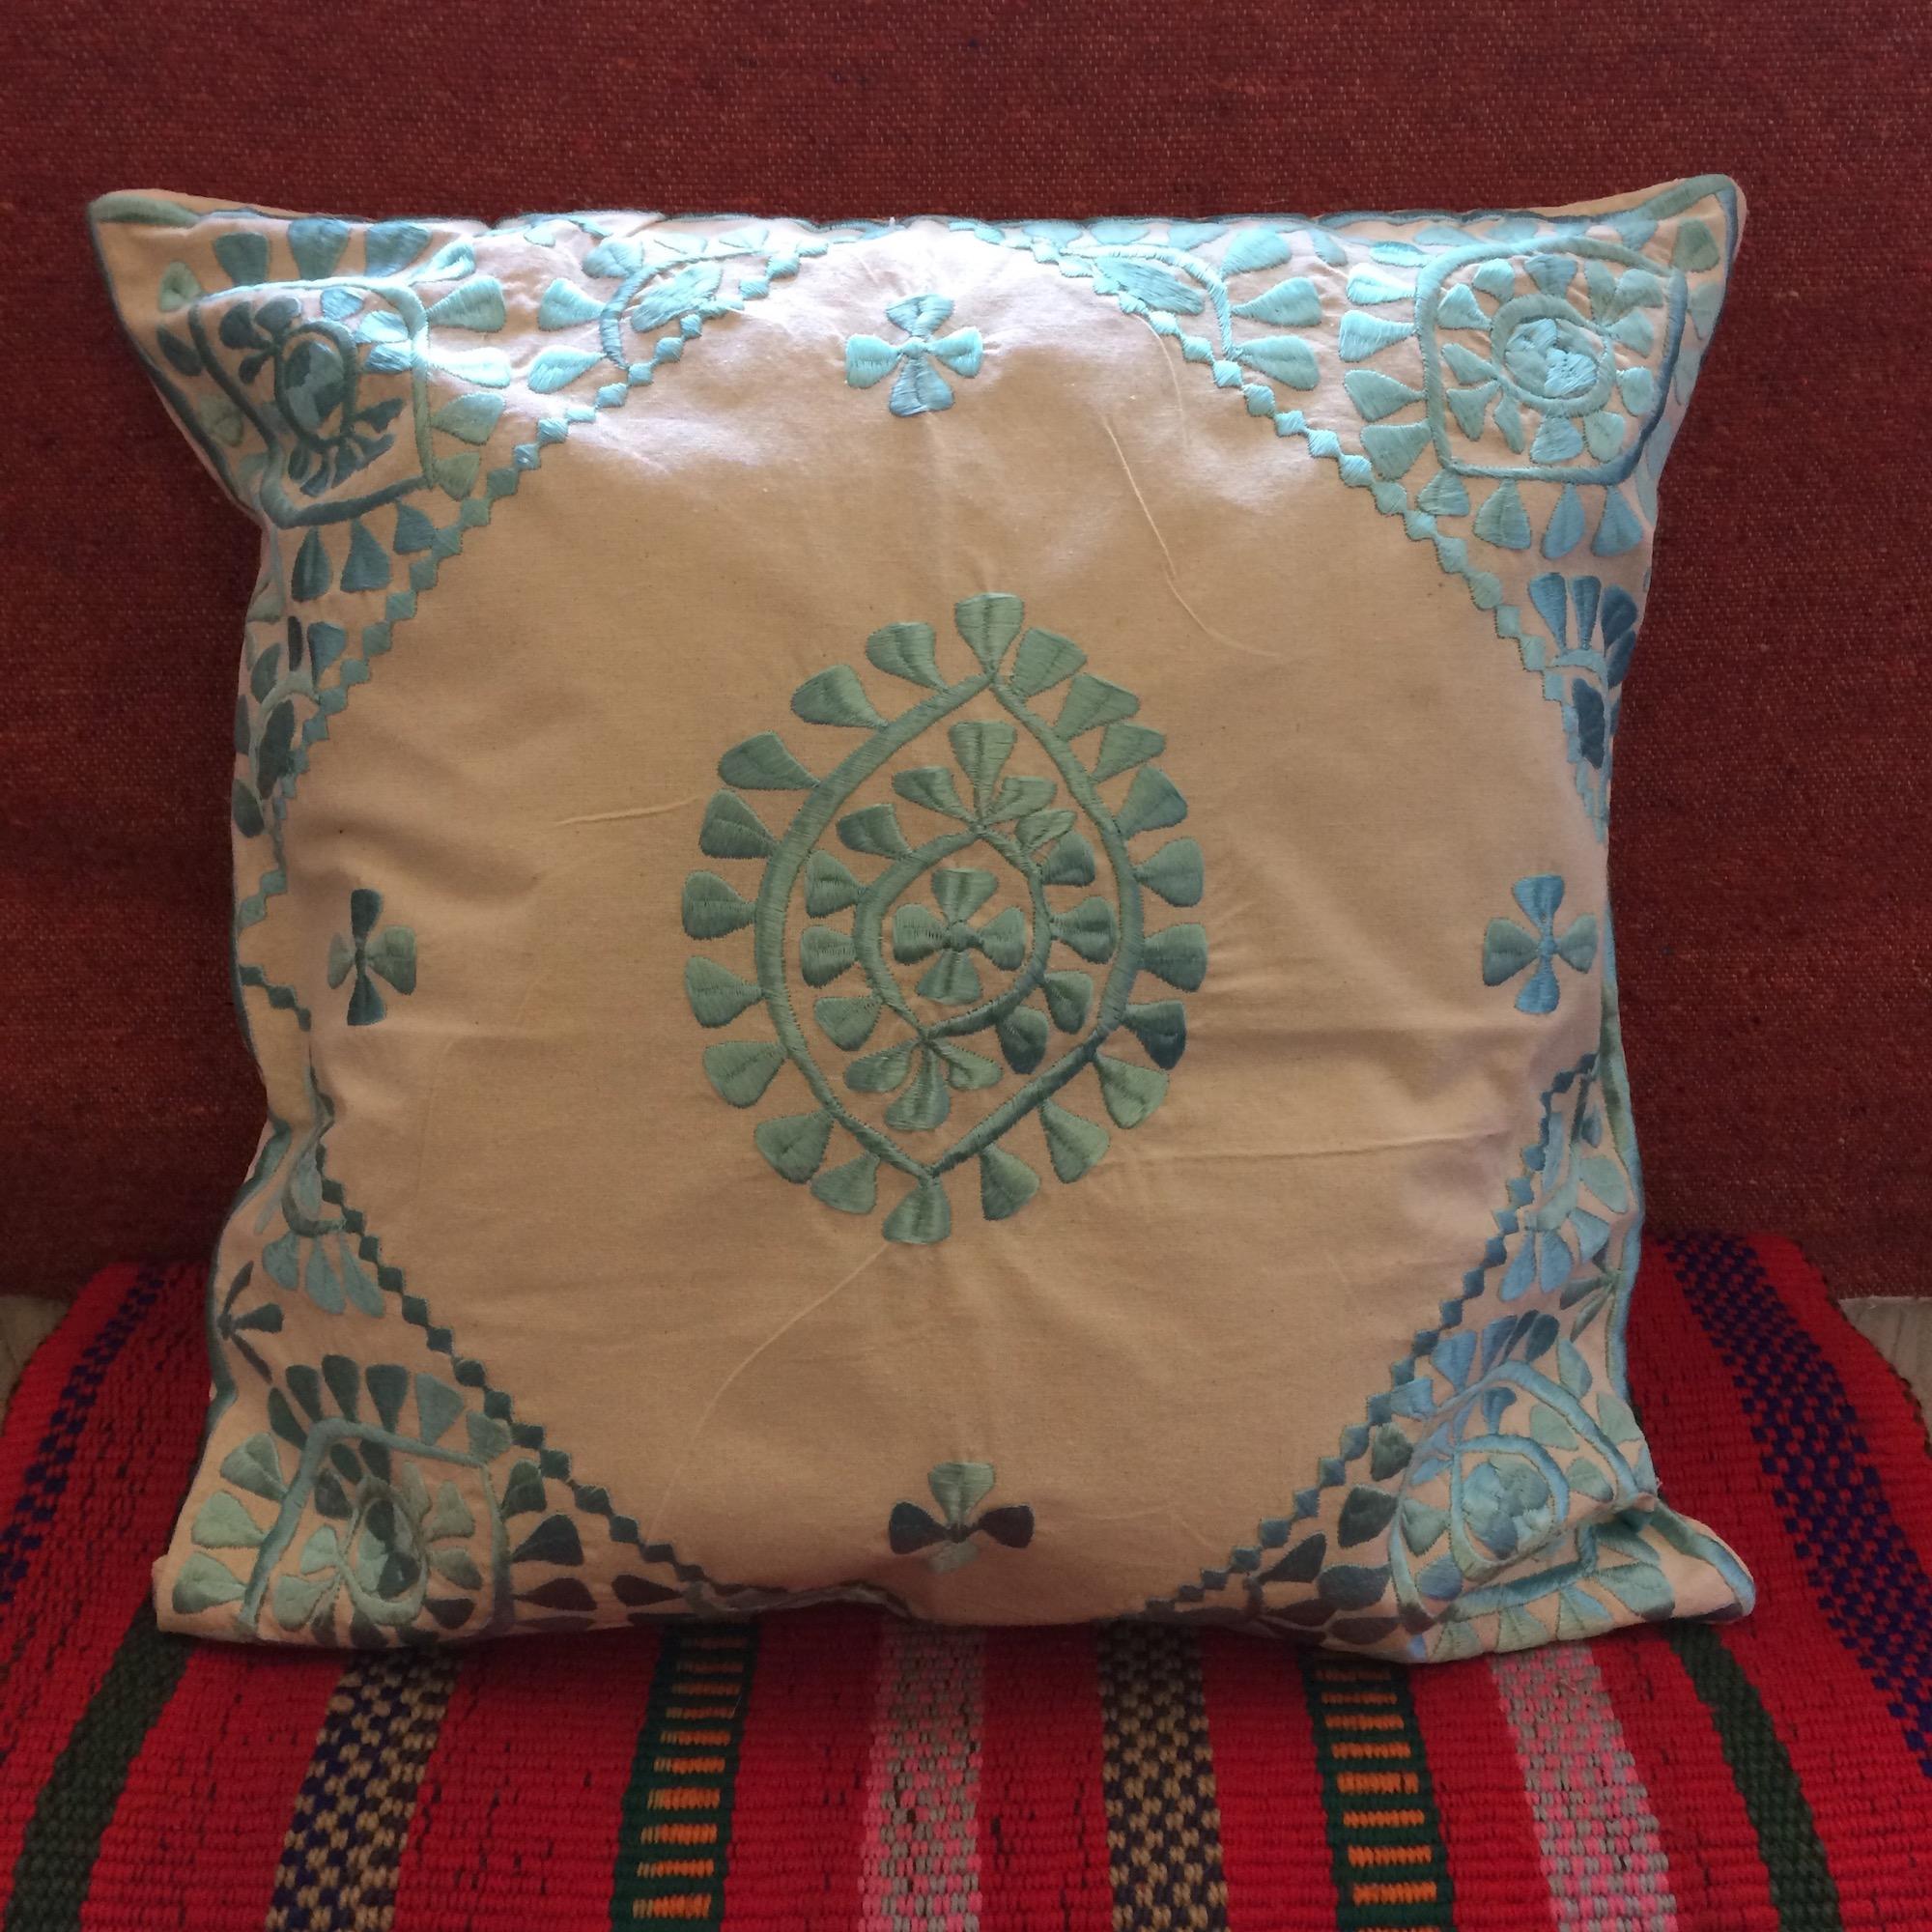 Moroccan Embroidered Cushion - Aqua Blue